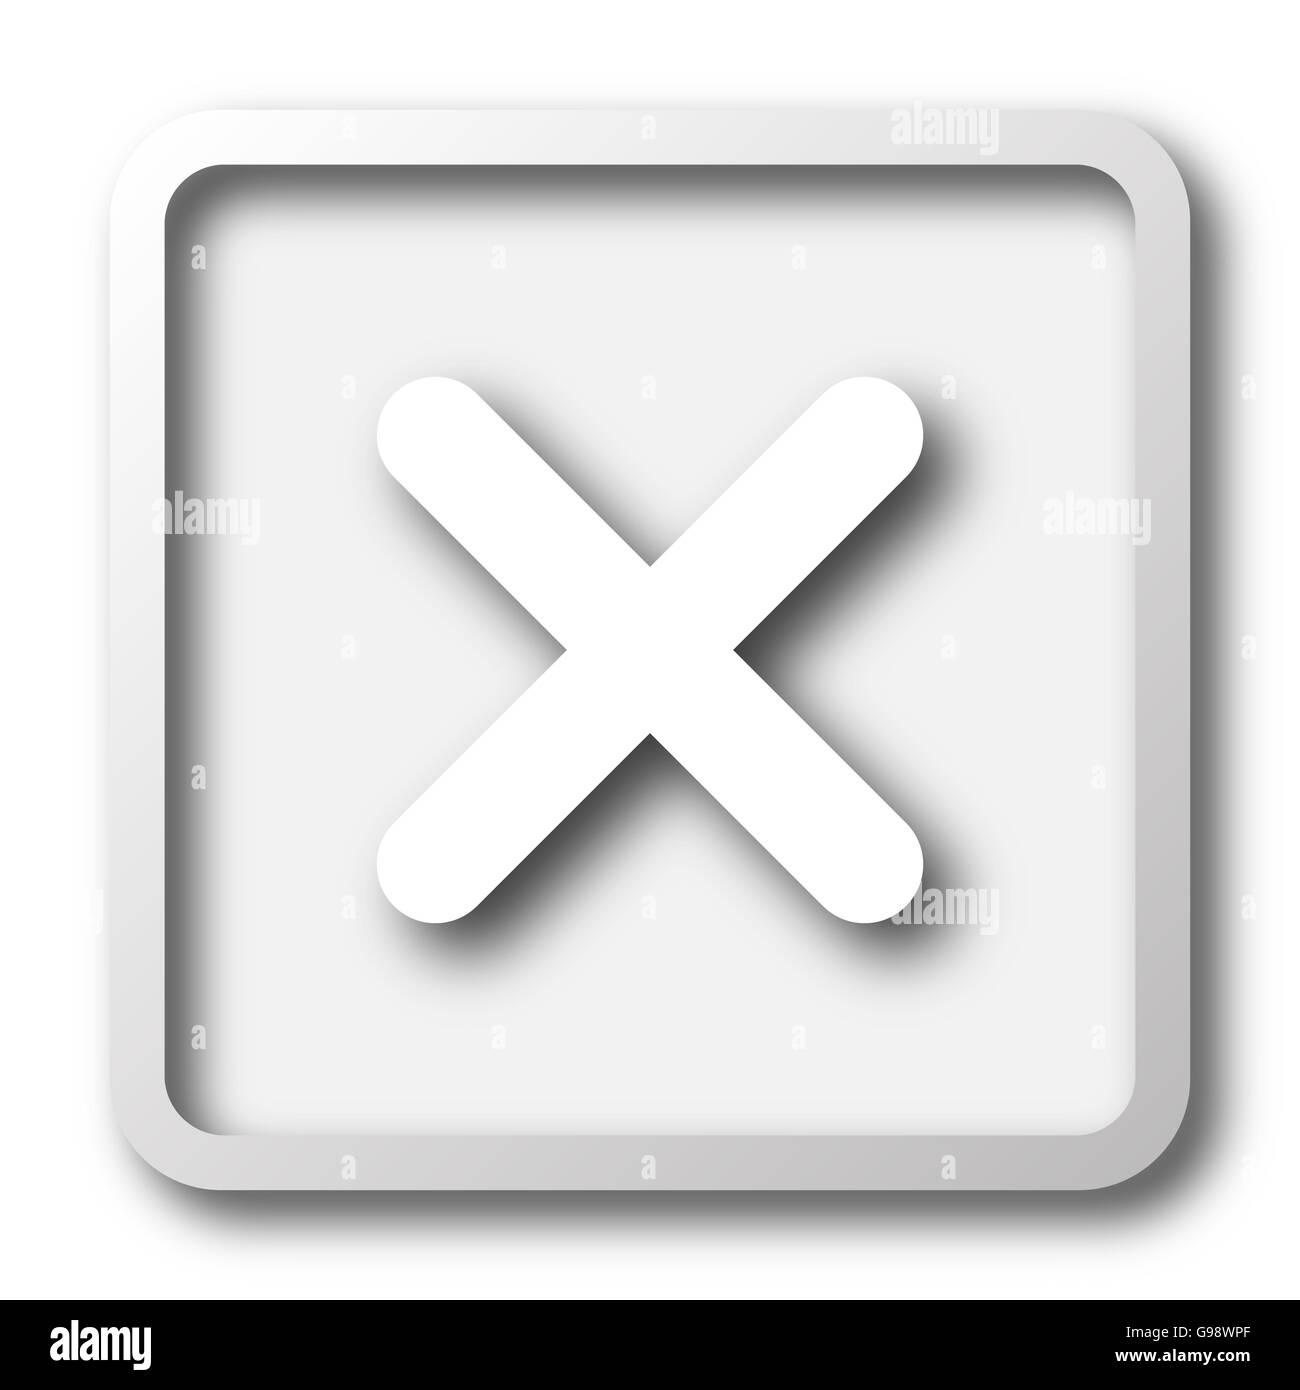 X close icon  Internet button on white background Stock